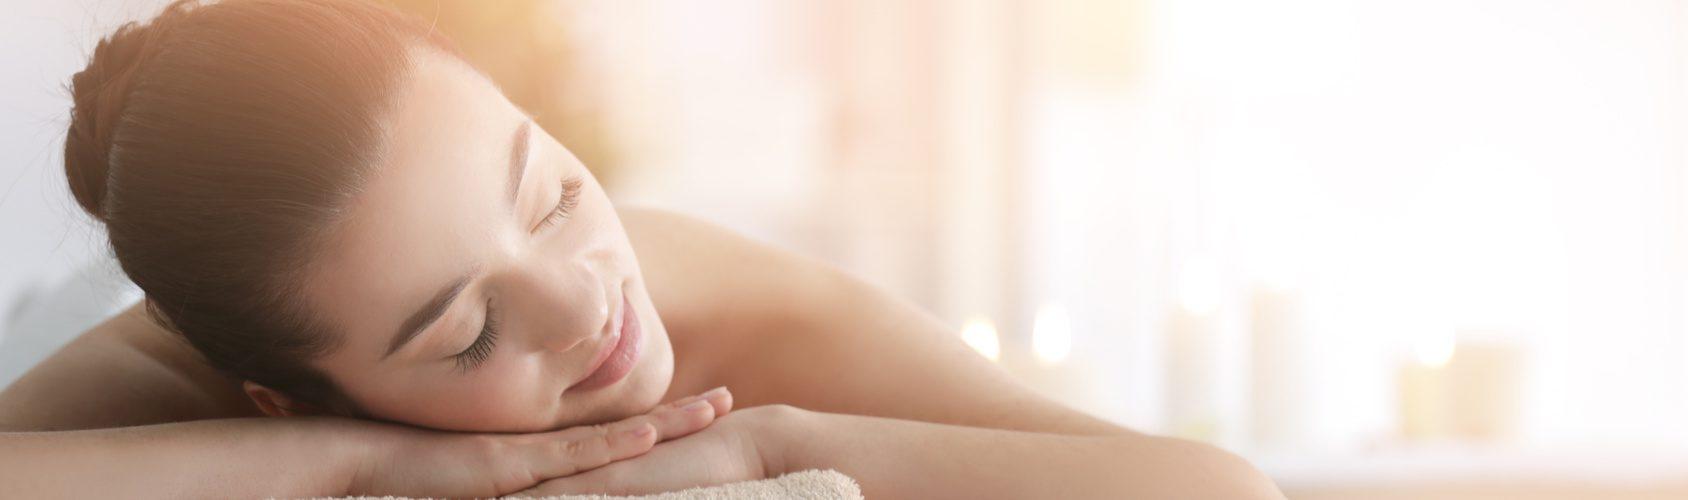 Körperpflege, Wellness, Massage, Entspannung